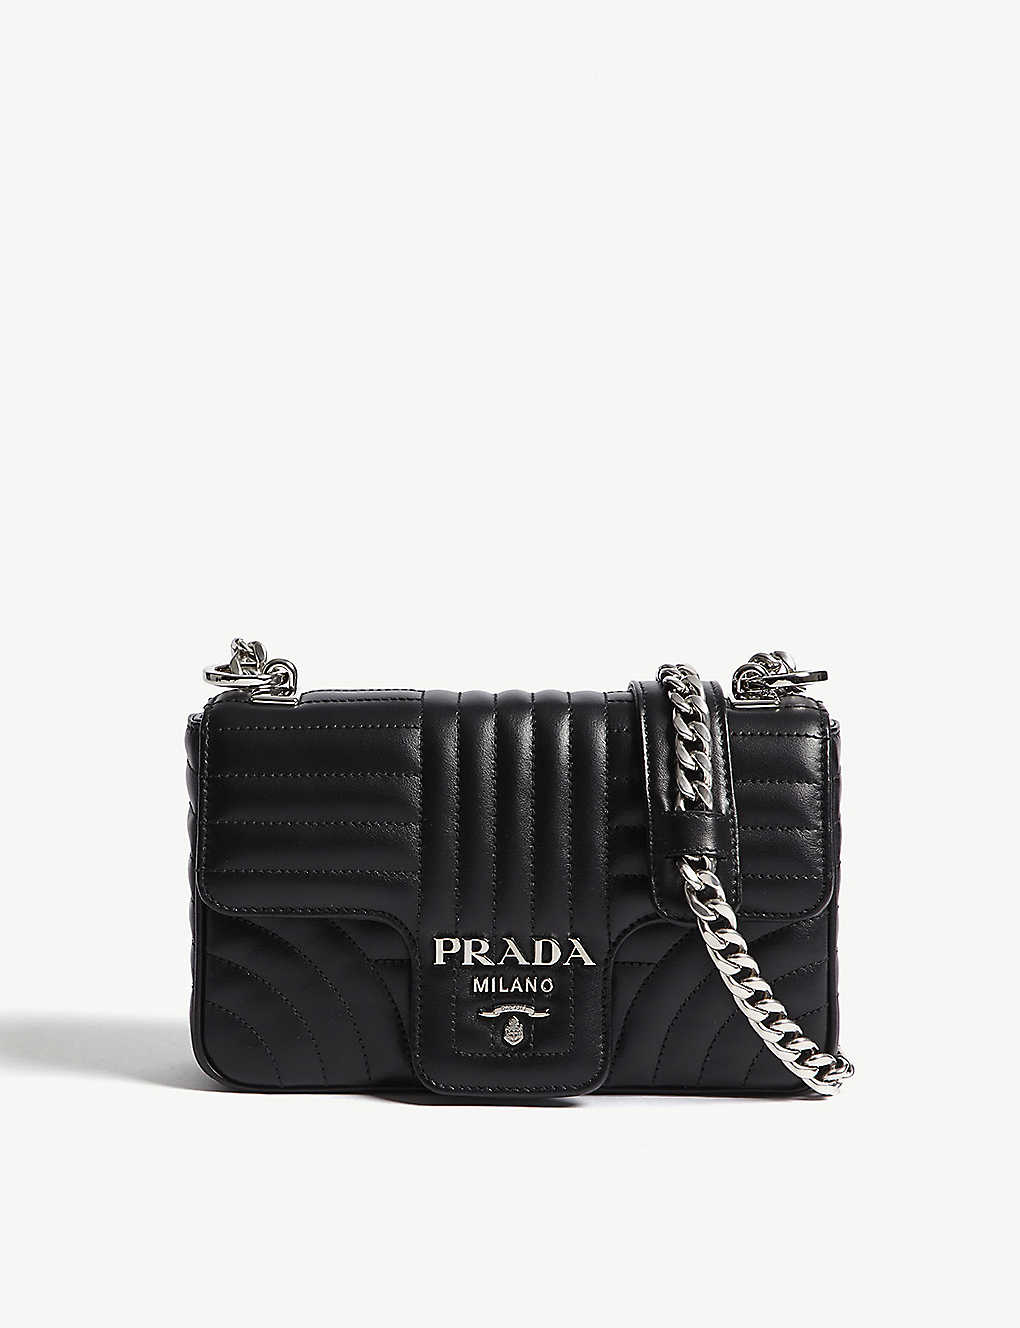 ca65b1842ad4 PRADA - Quilted leather shoulder bag | Selfridges.com